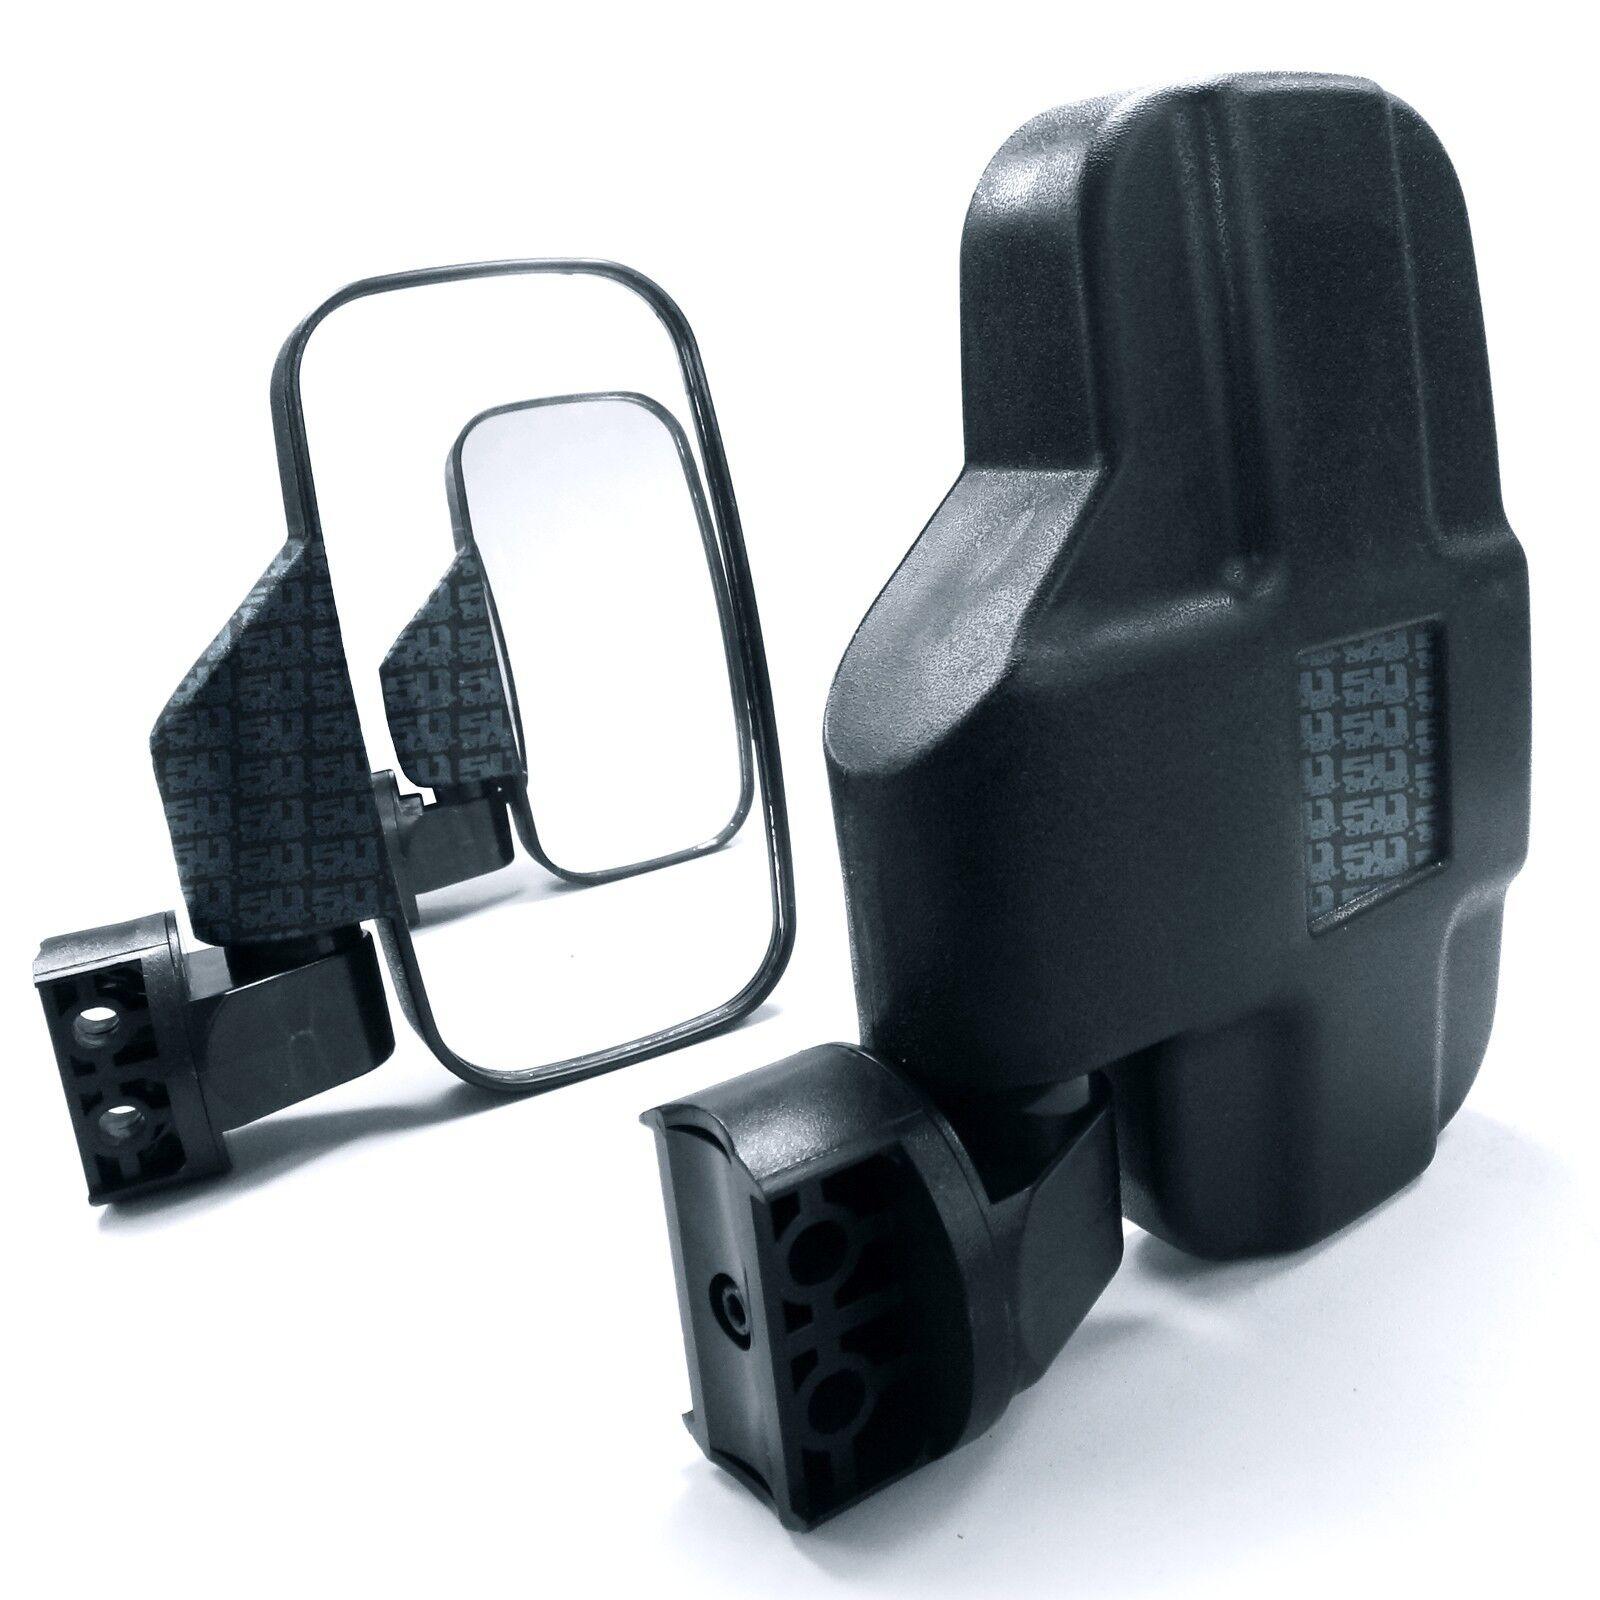 Driver & Passenger Side Breakaway Side View Mirrors fits Kubota RTV-X 900, 1120D